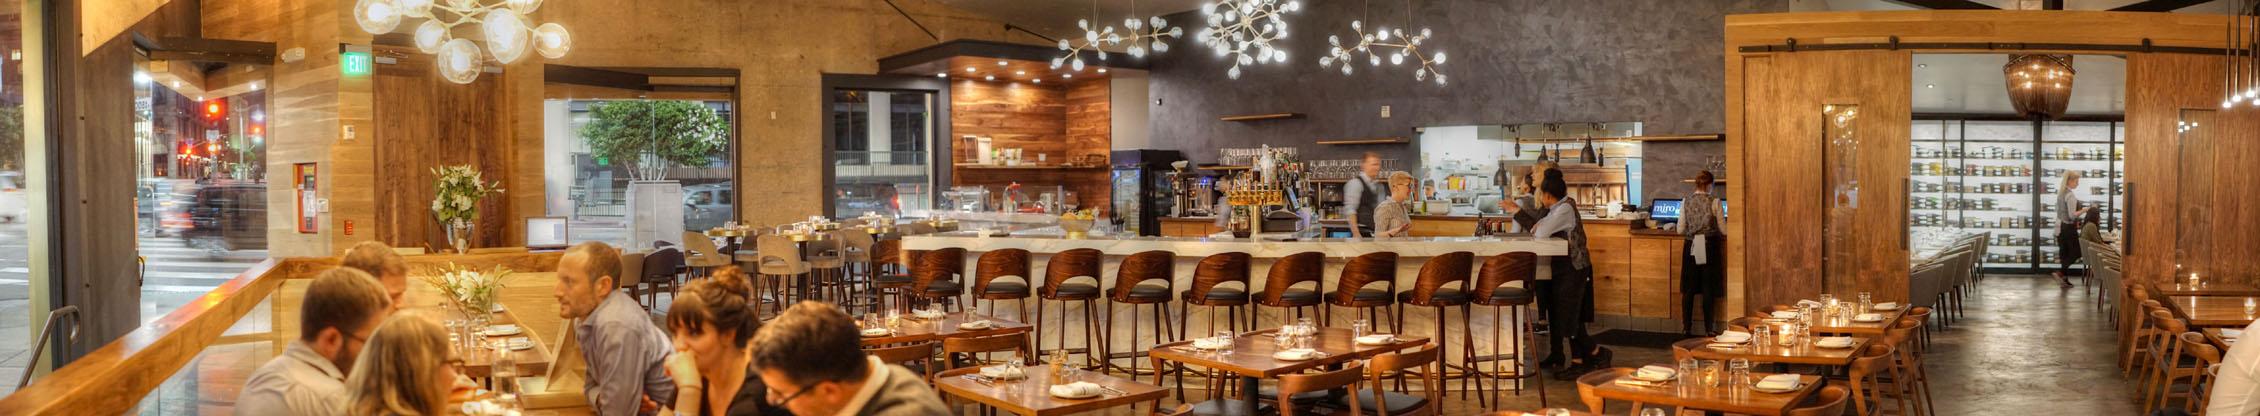 Miro Dining Room